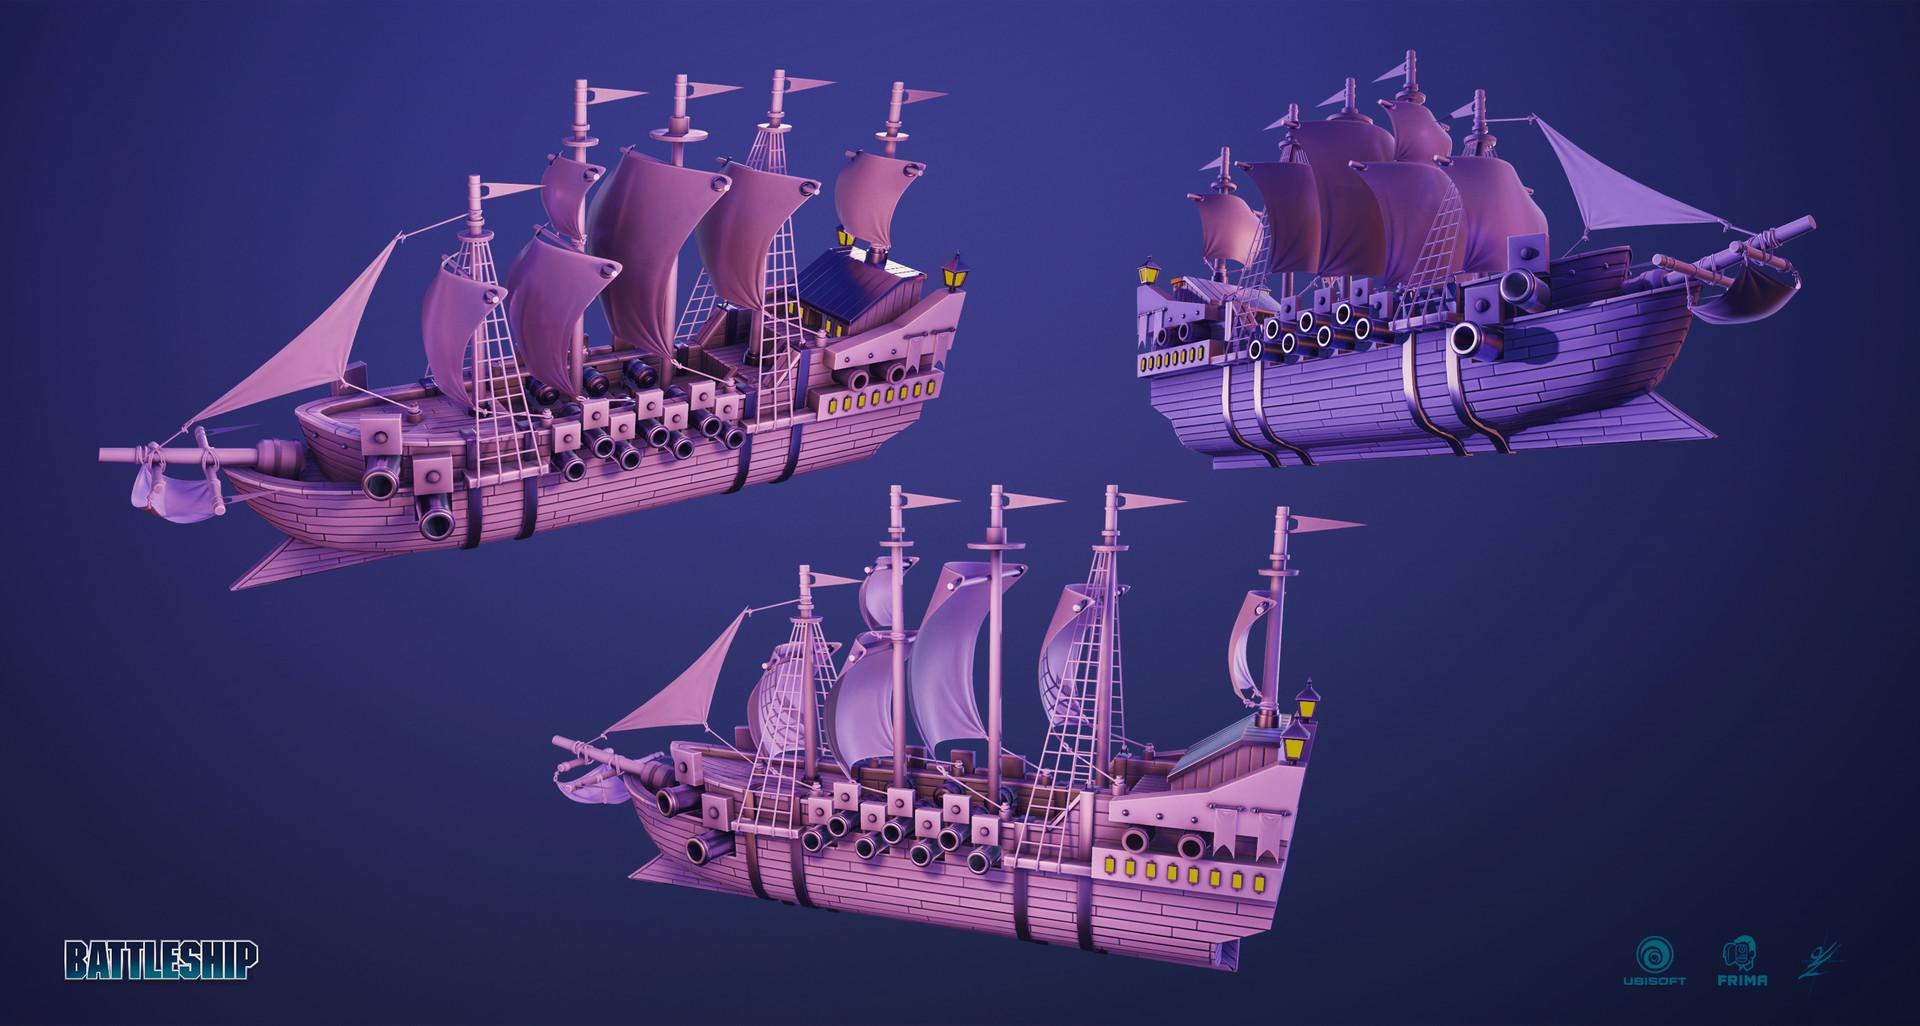 Guillaume lachance pirate battleship 01